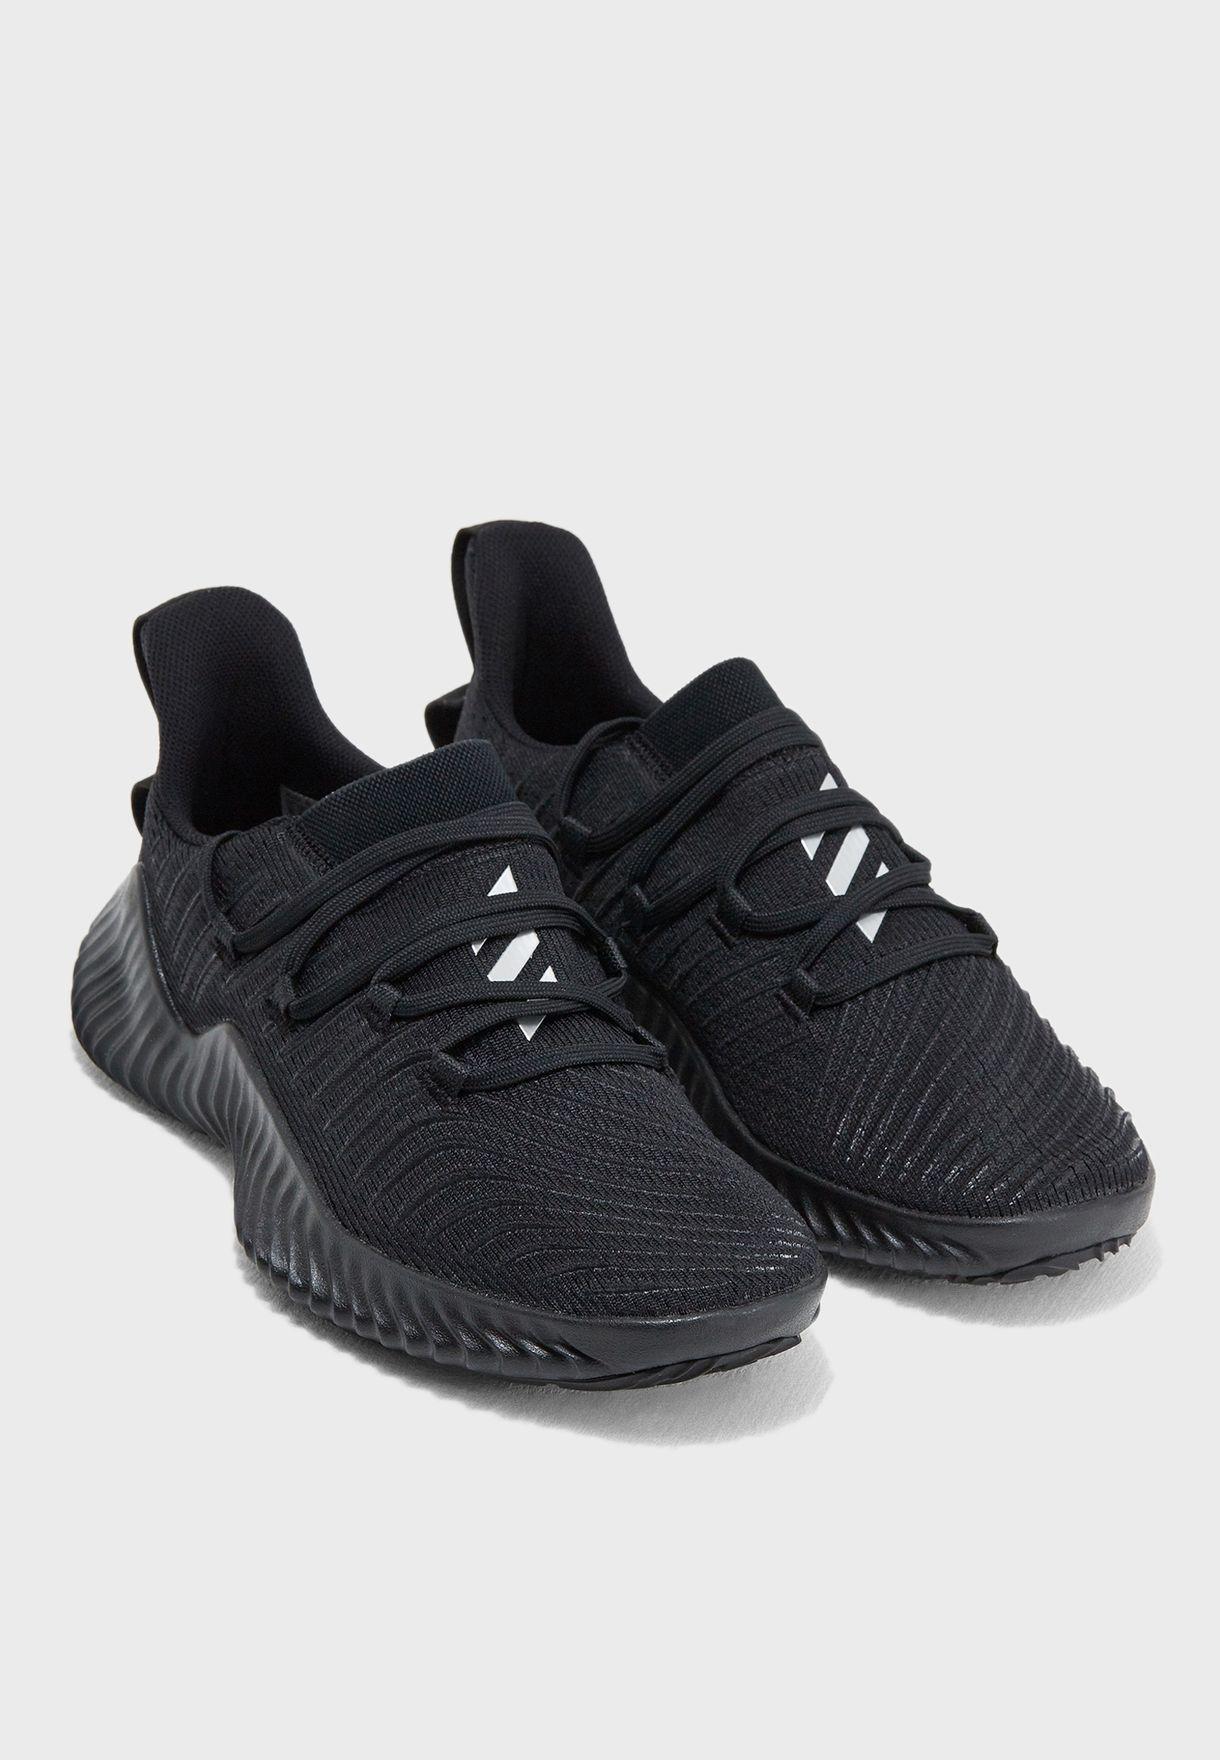 41959c0103764 Shop adidas black Alphabounce Trainer AQ0609 for Men in UAE ...